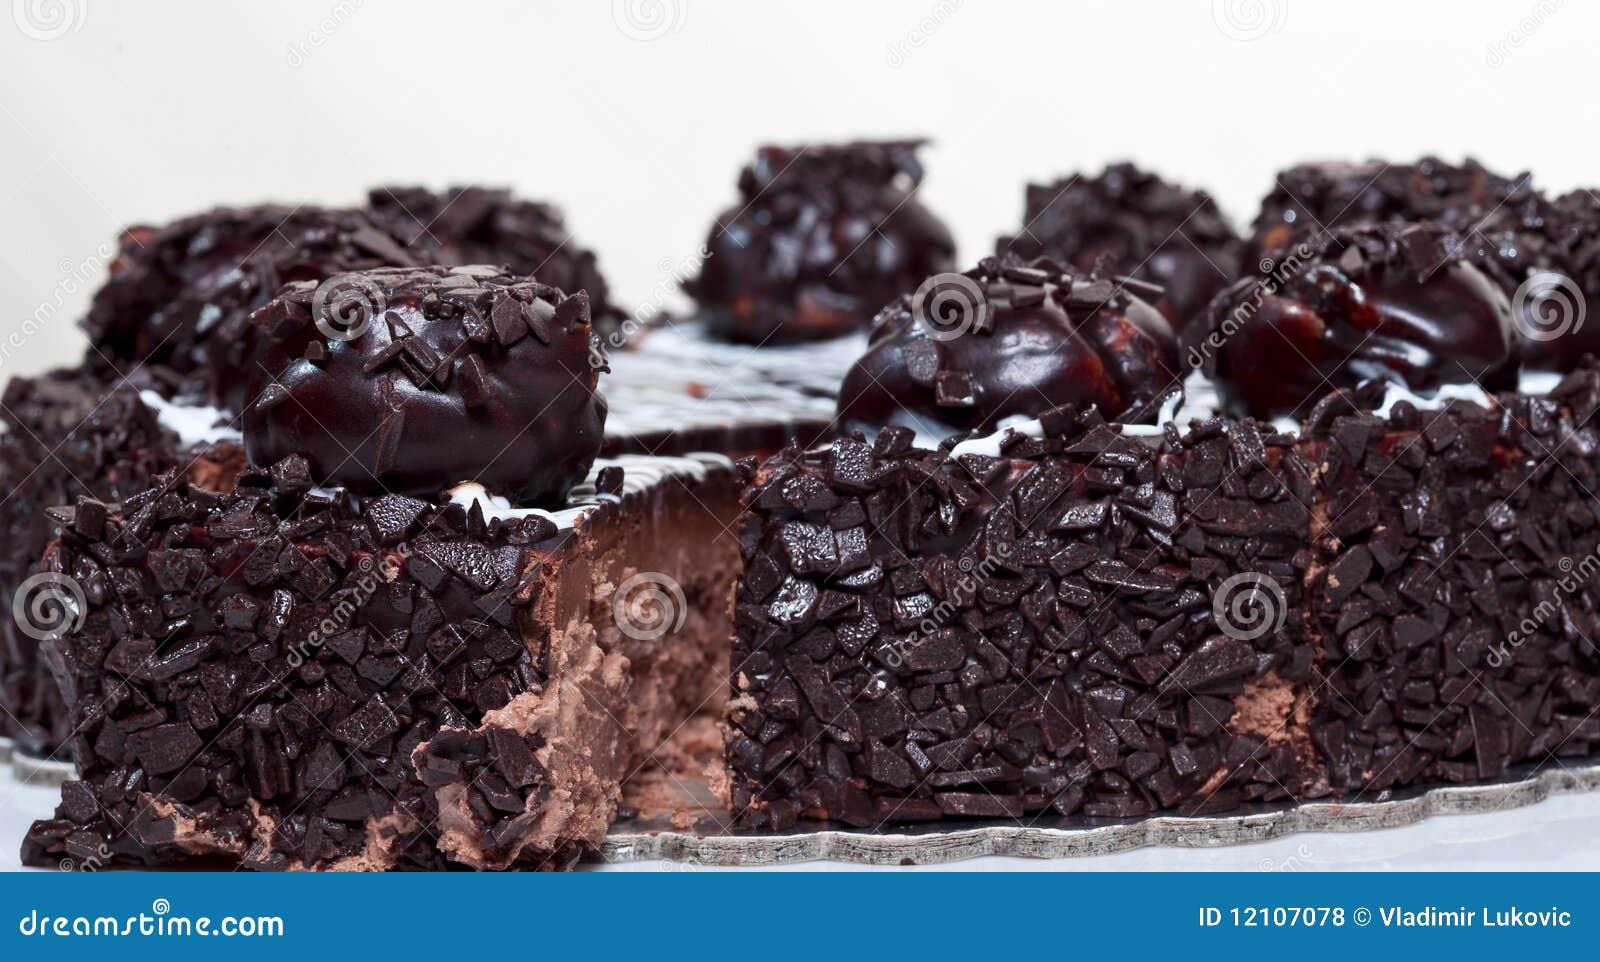 Images Of Round Chocolate Cake : Round chocolate cake stock photo. Image of single ...